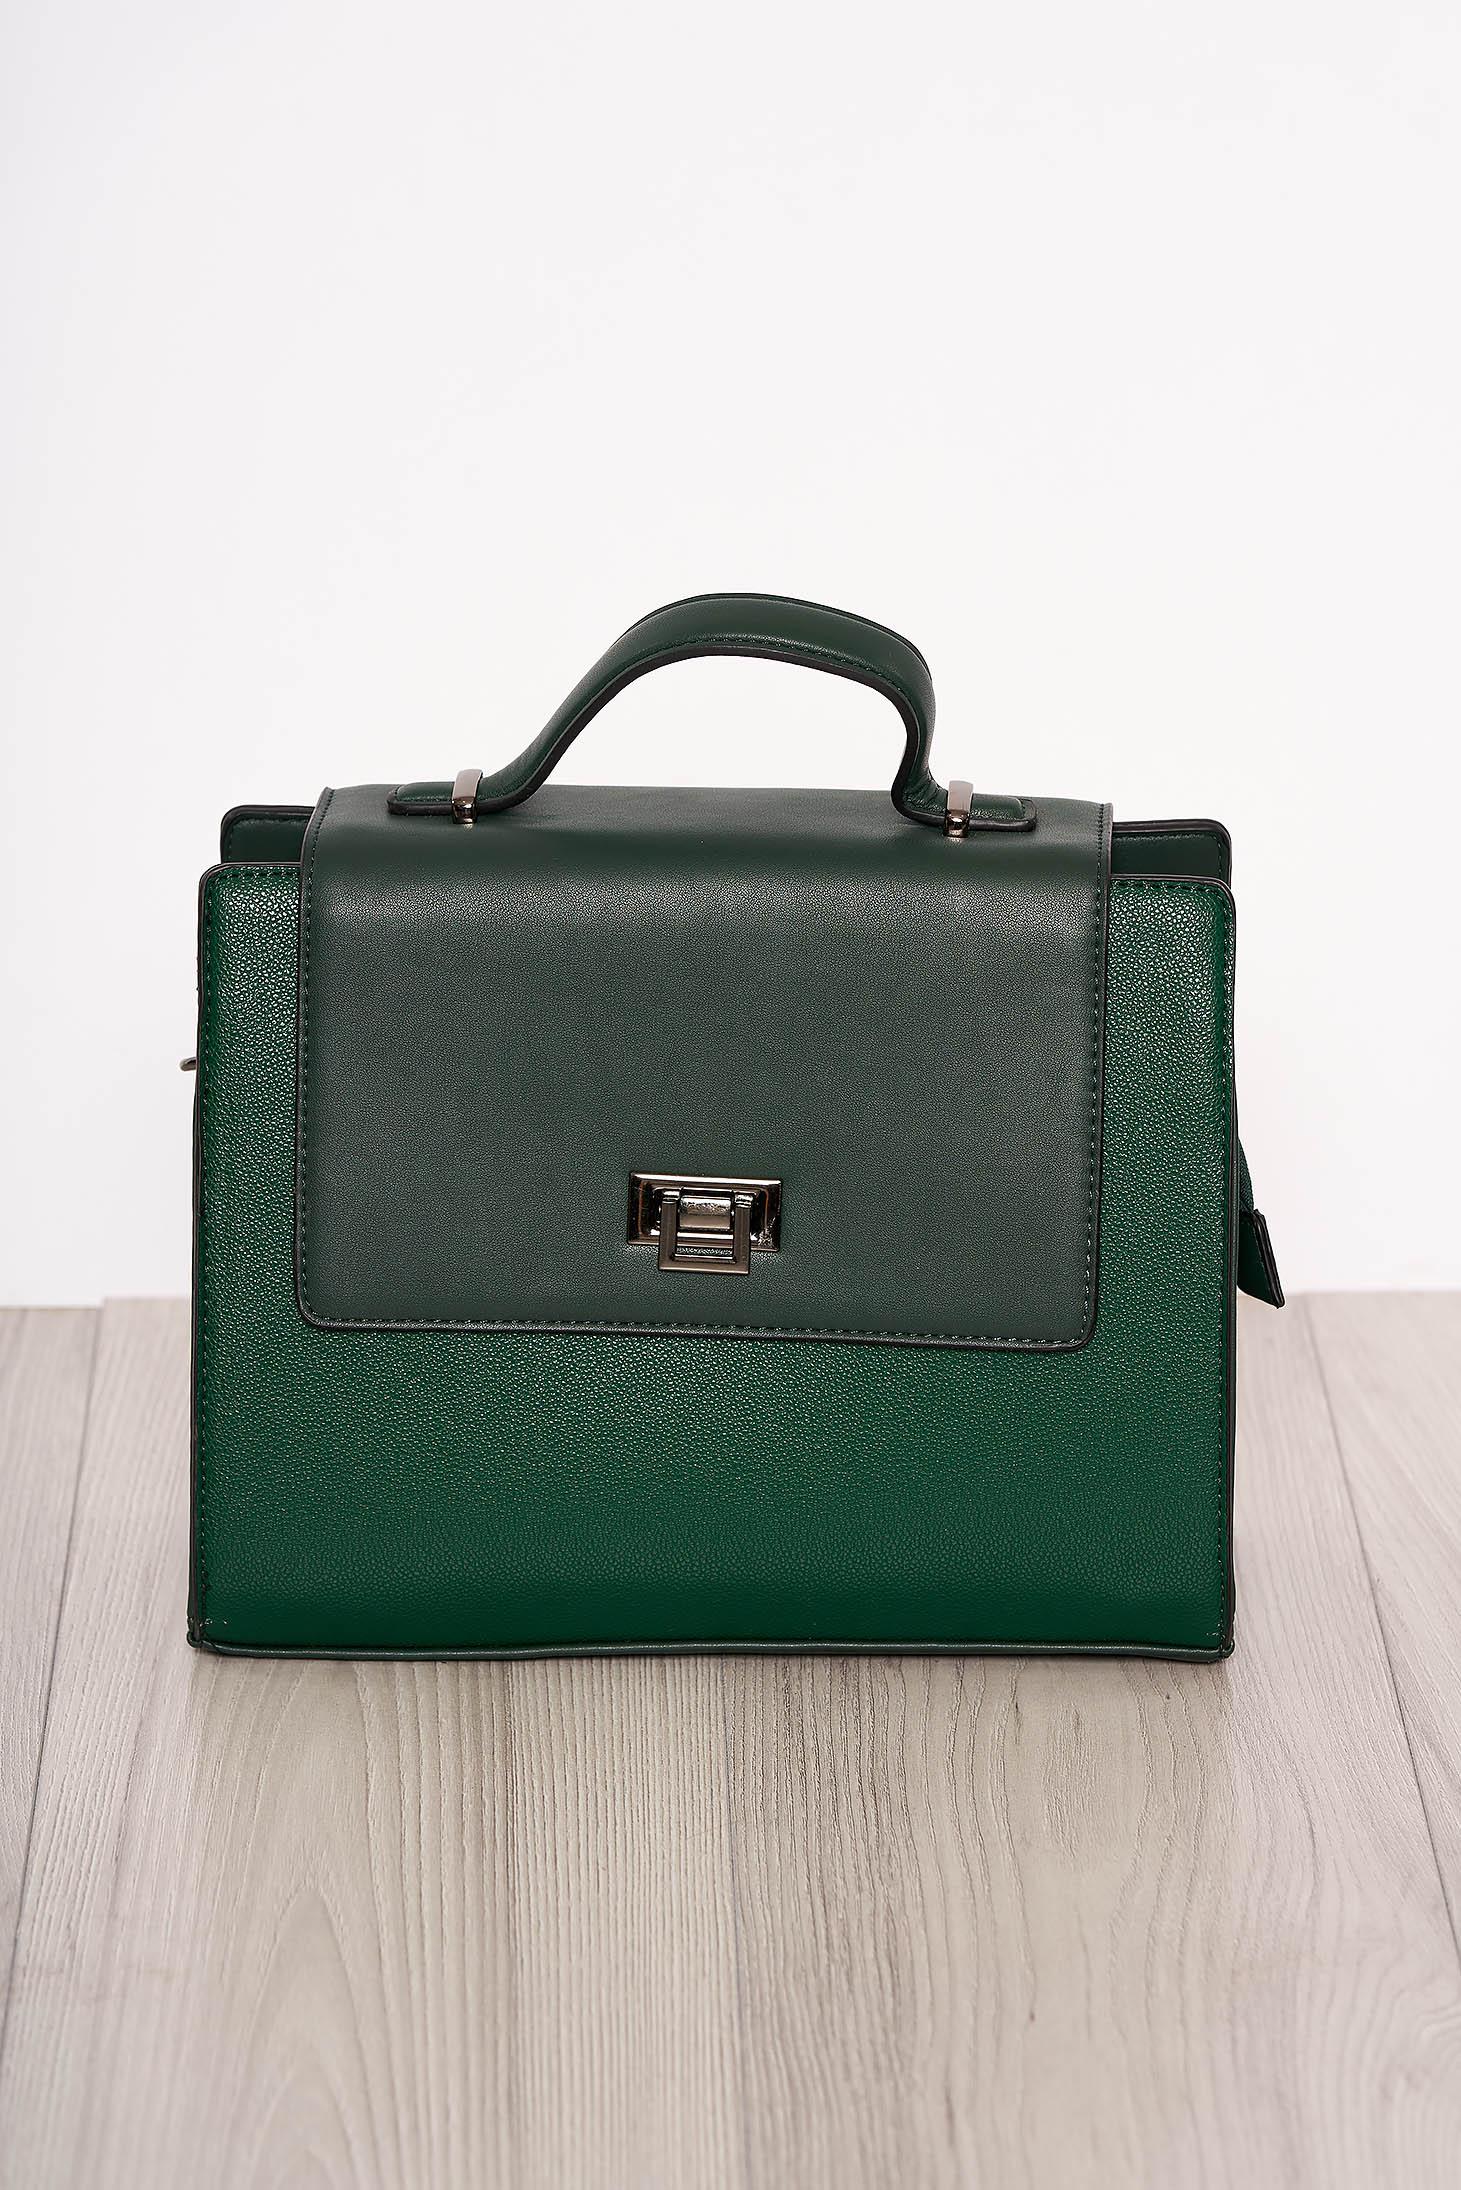 Bag green elegant faux leather short handles